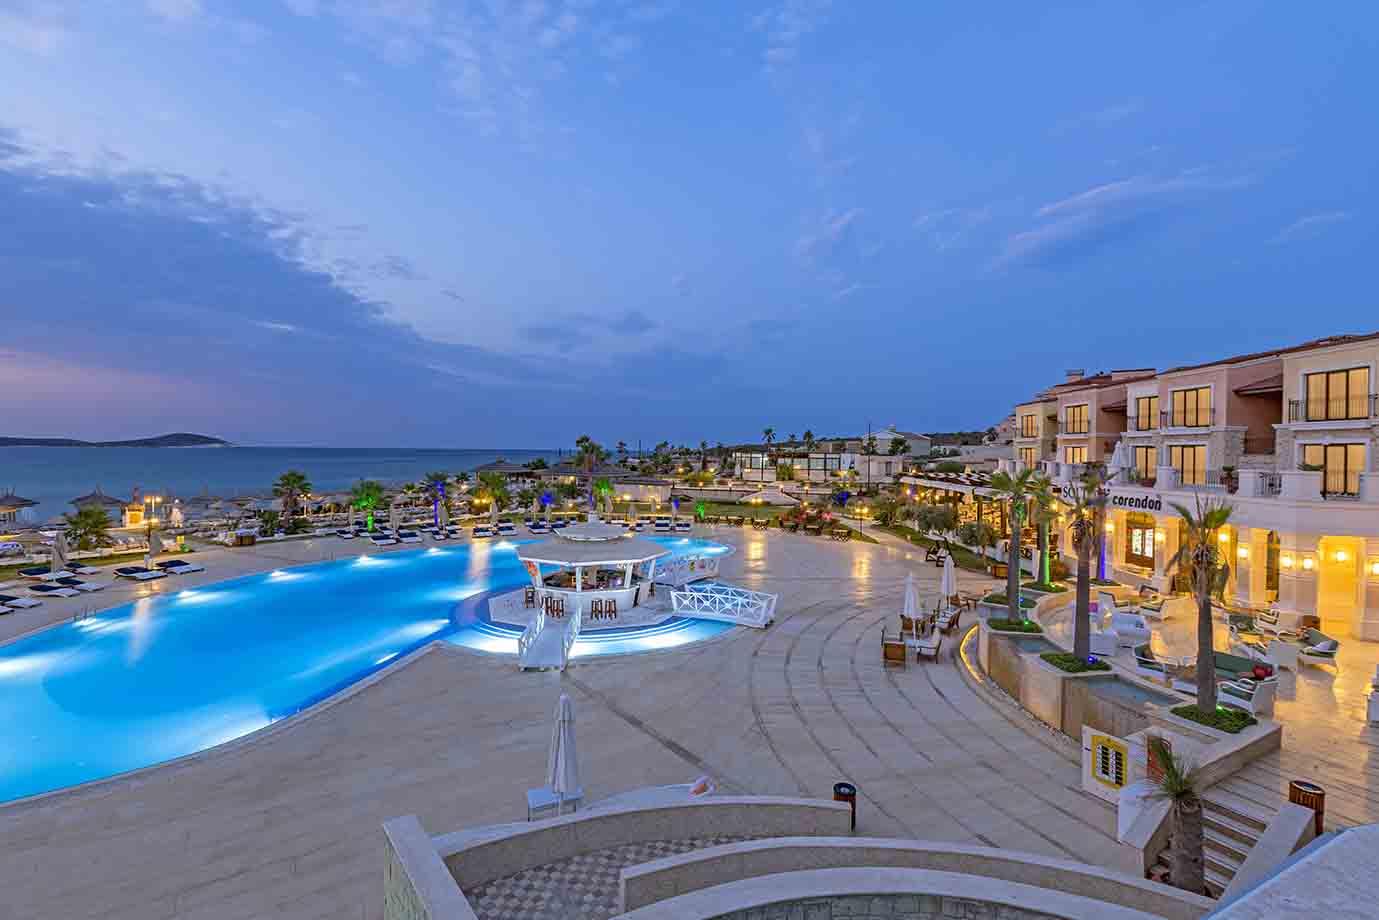 Premier Solto Hotel by Corendon 281096